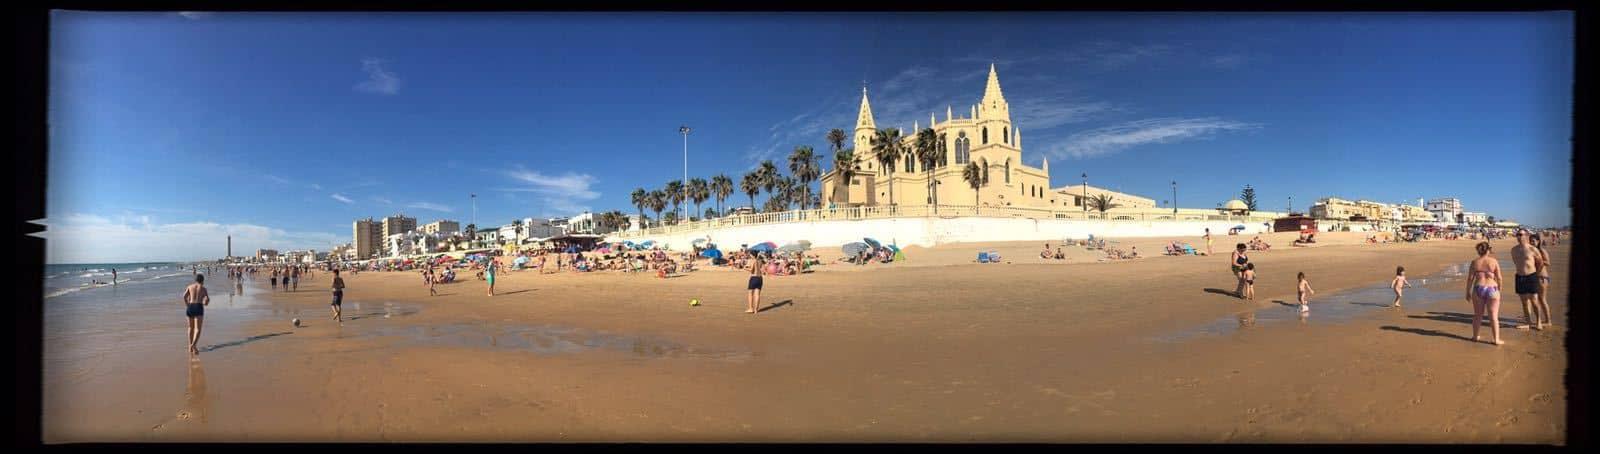 Playa de Regla en Chipiona, imágen panorámica